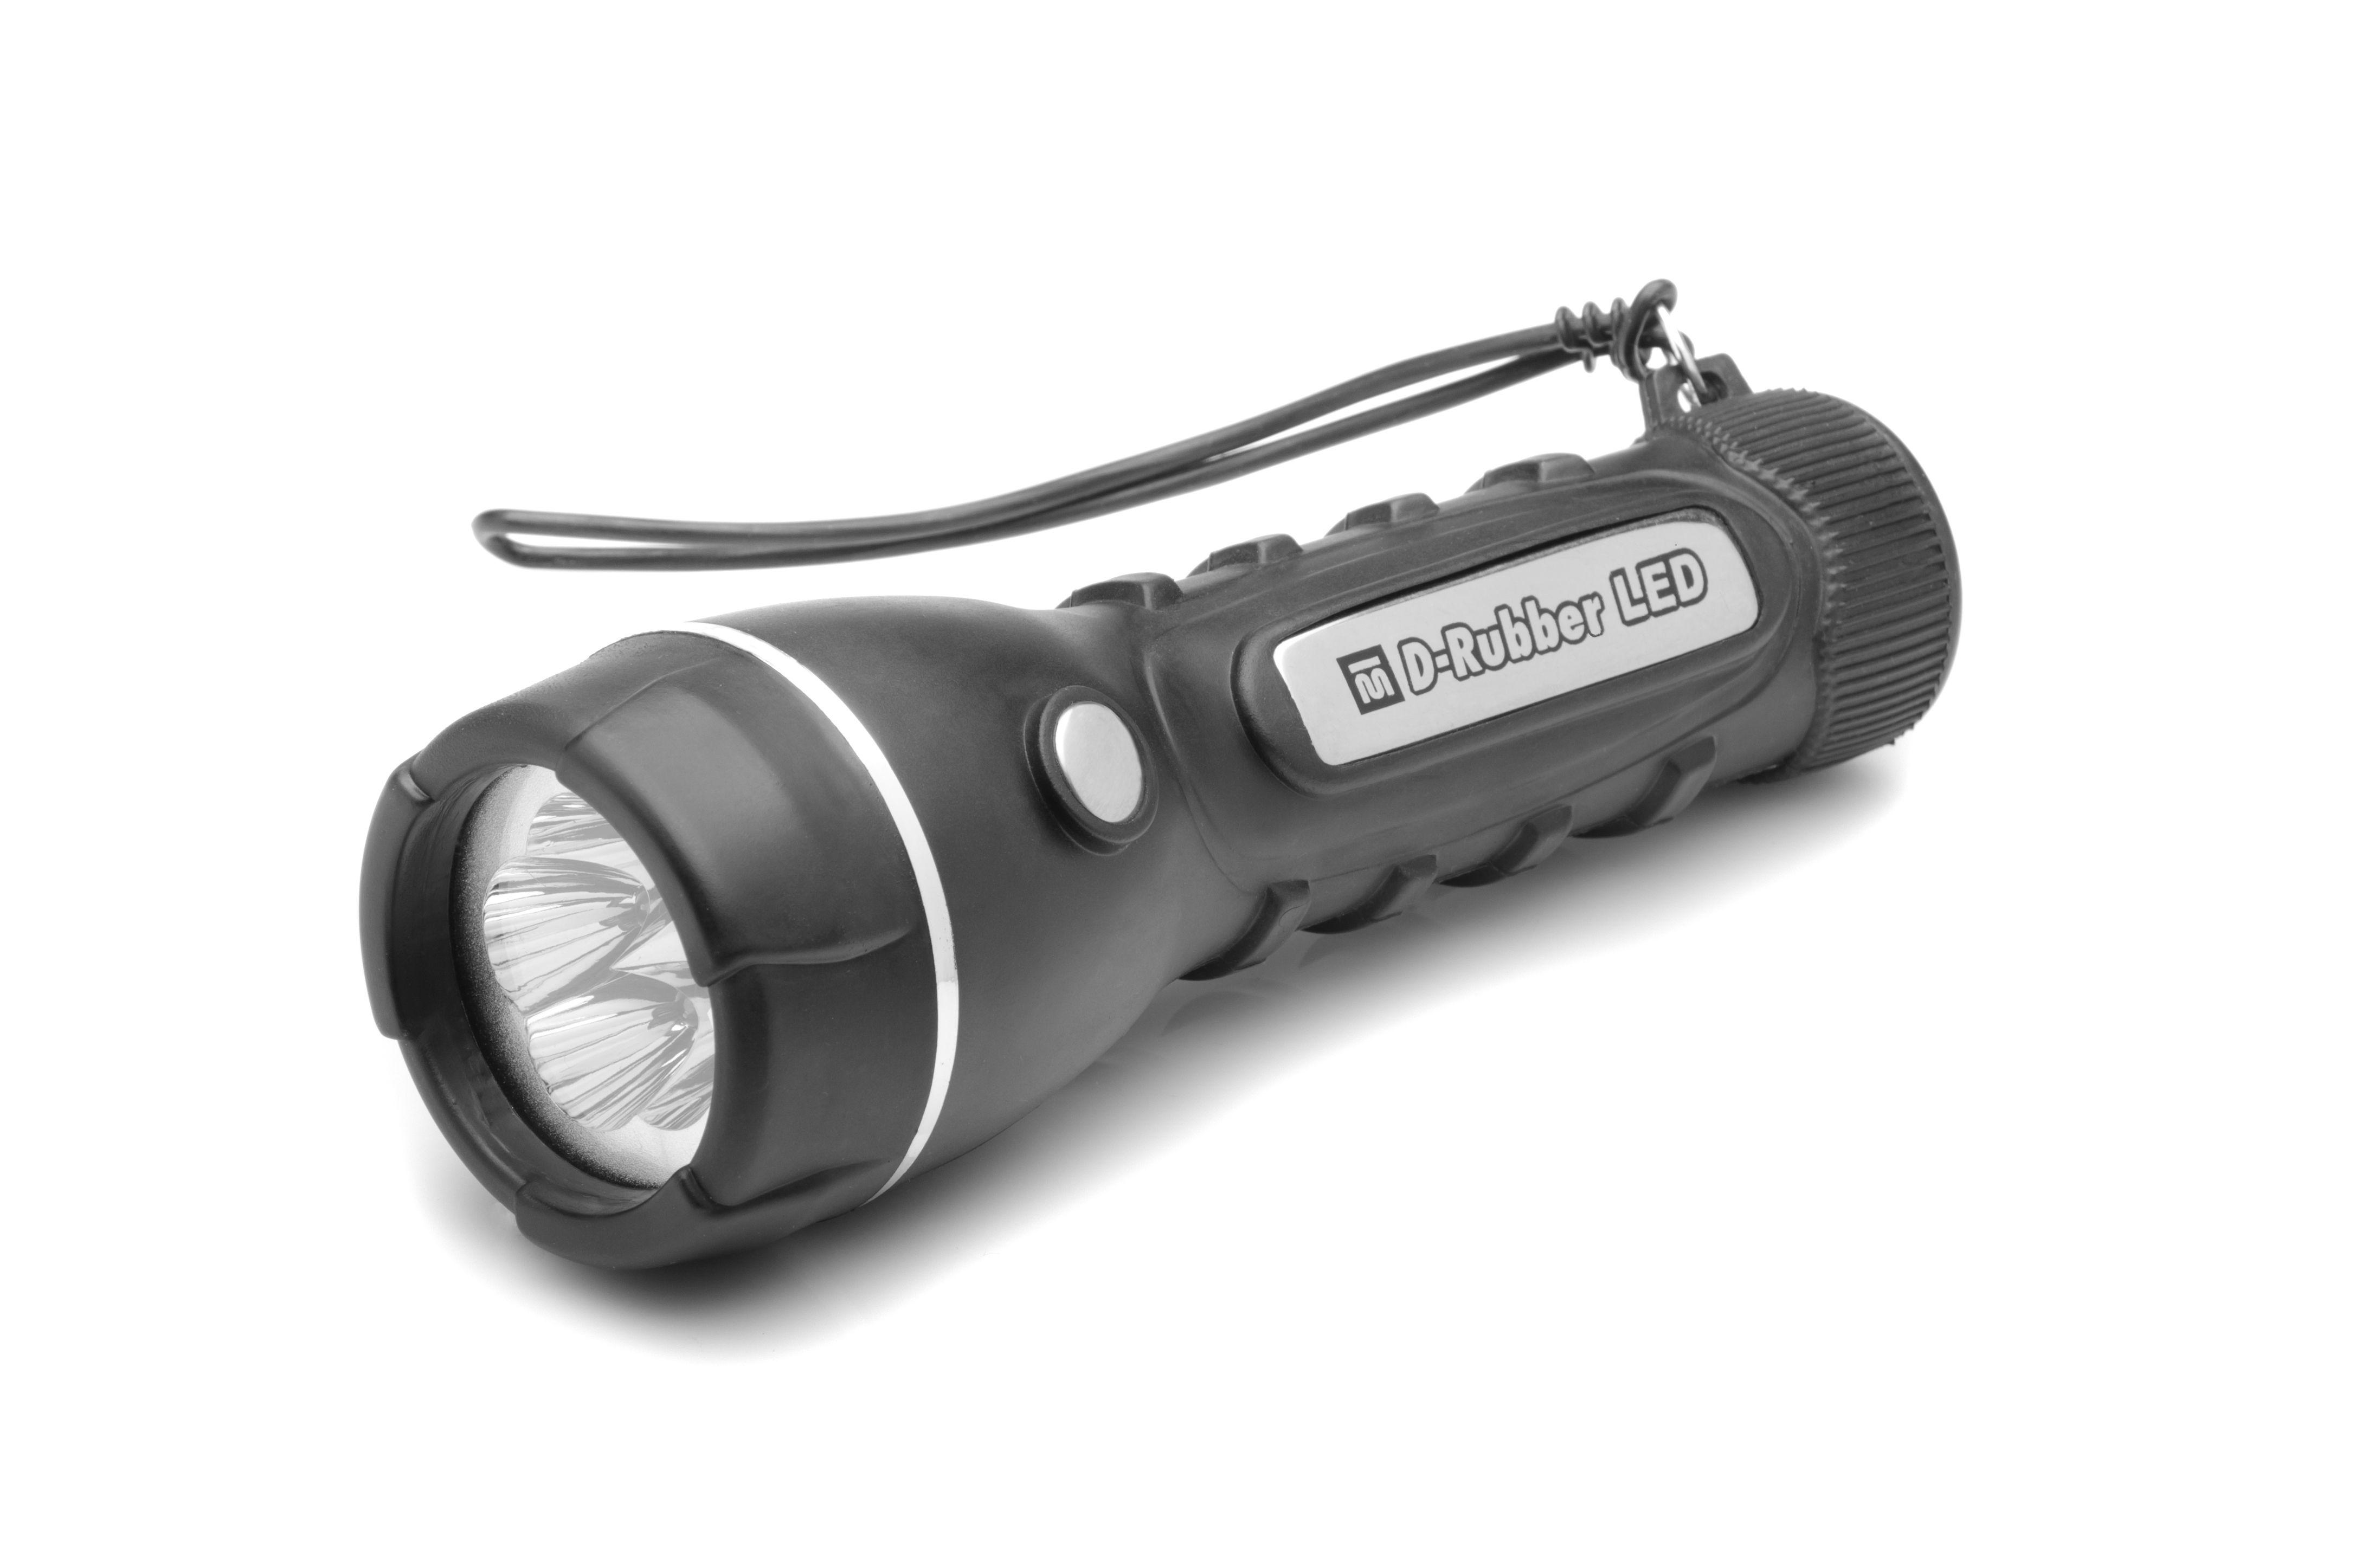 Pairdeer LED GY878B Vasaljós